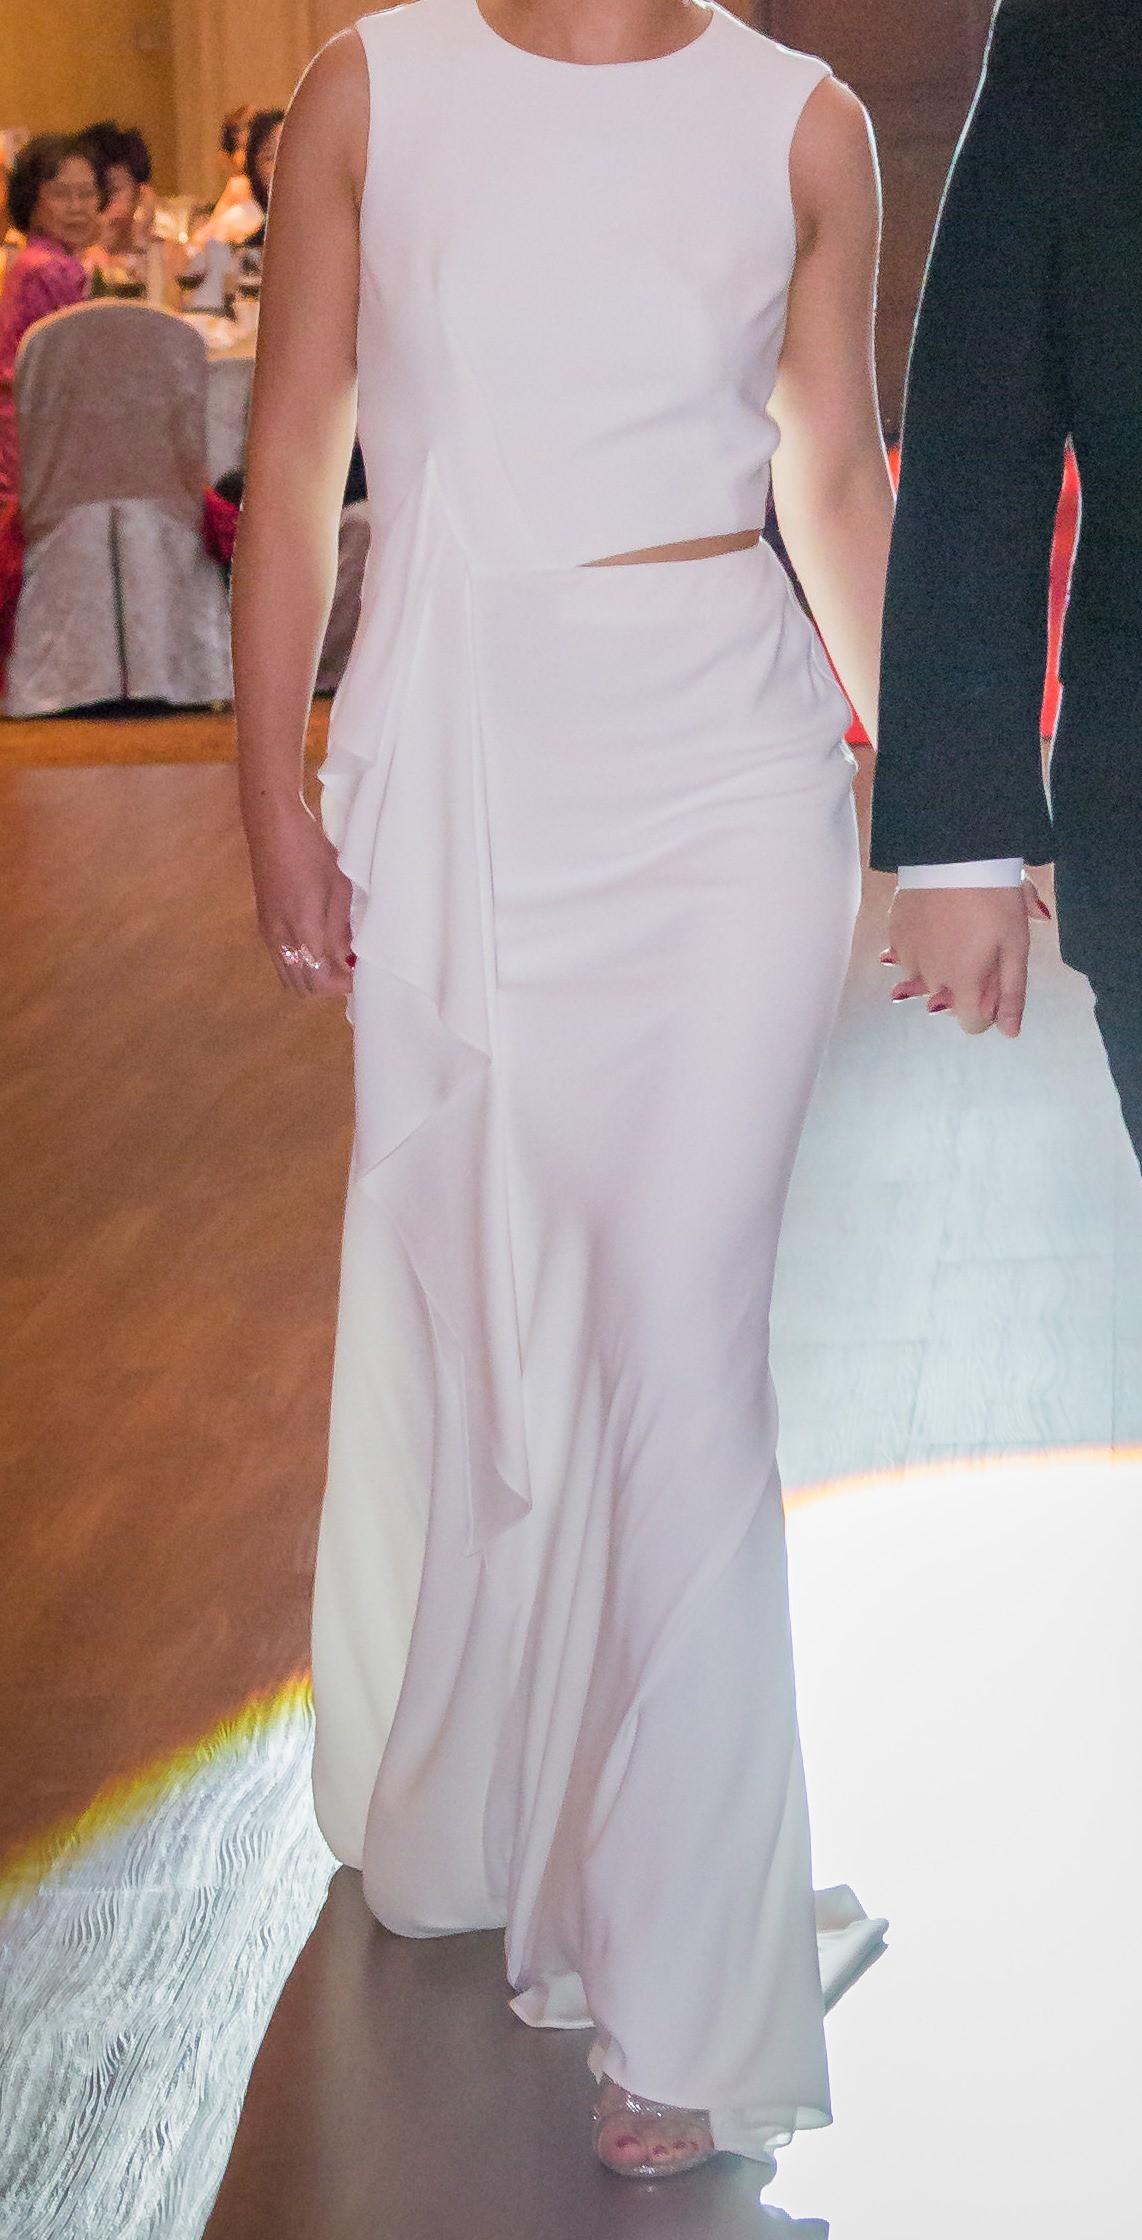 Alexander mcqueen wfo 414342 preowned wedding dress on for Alexander mcqueen wedding dresses price